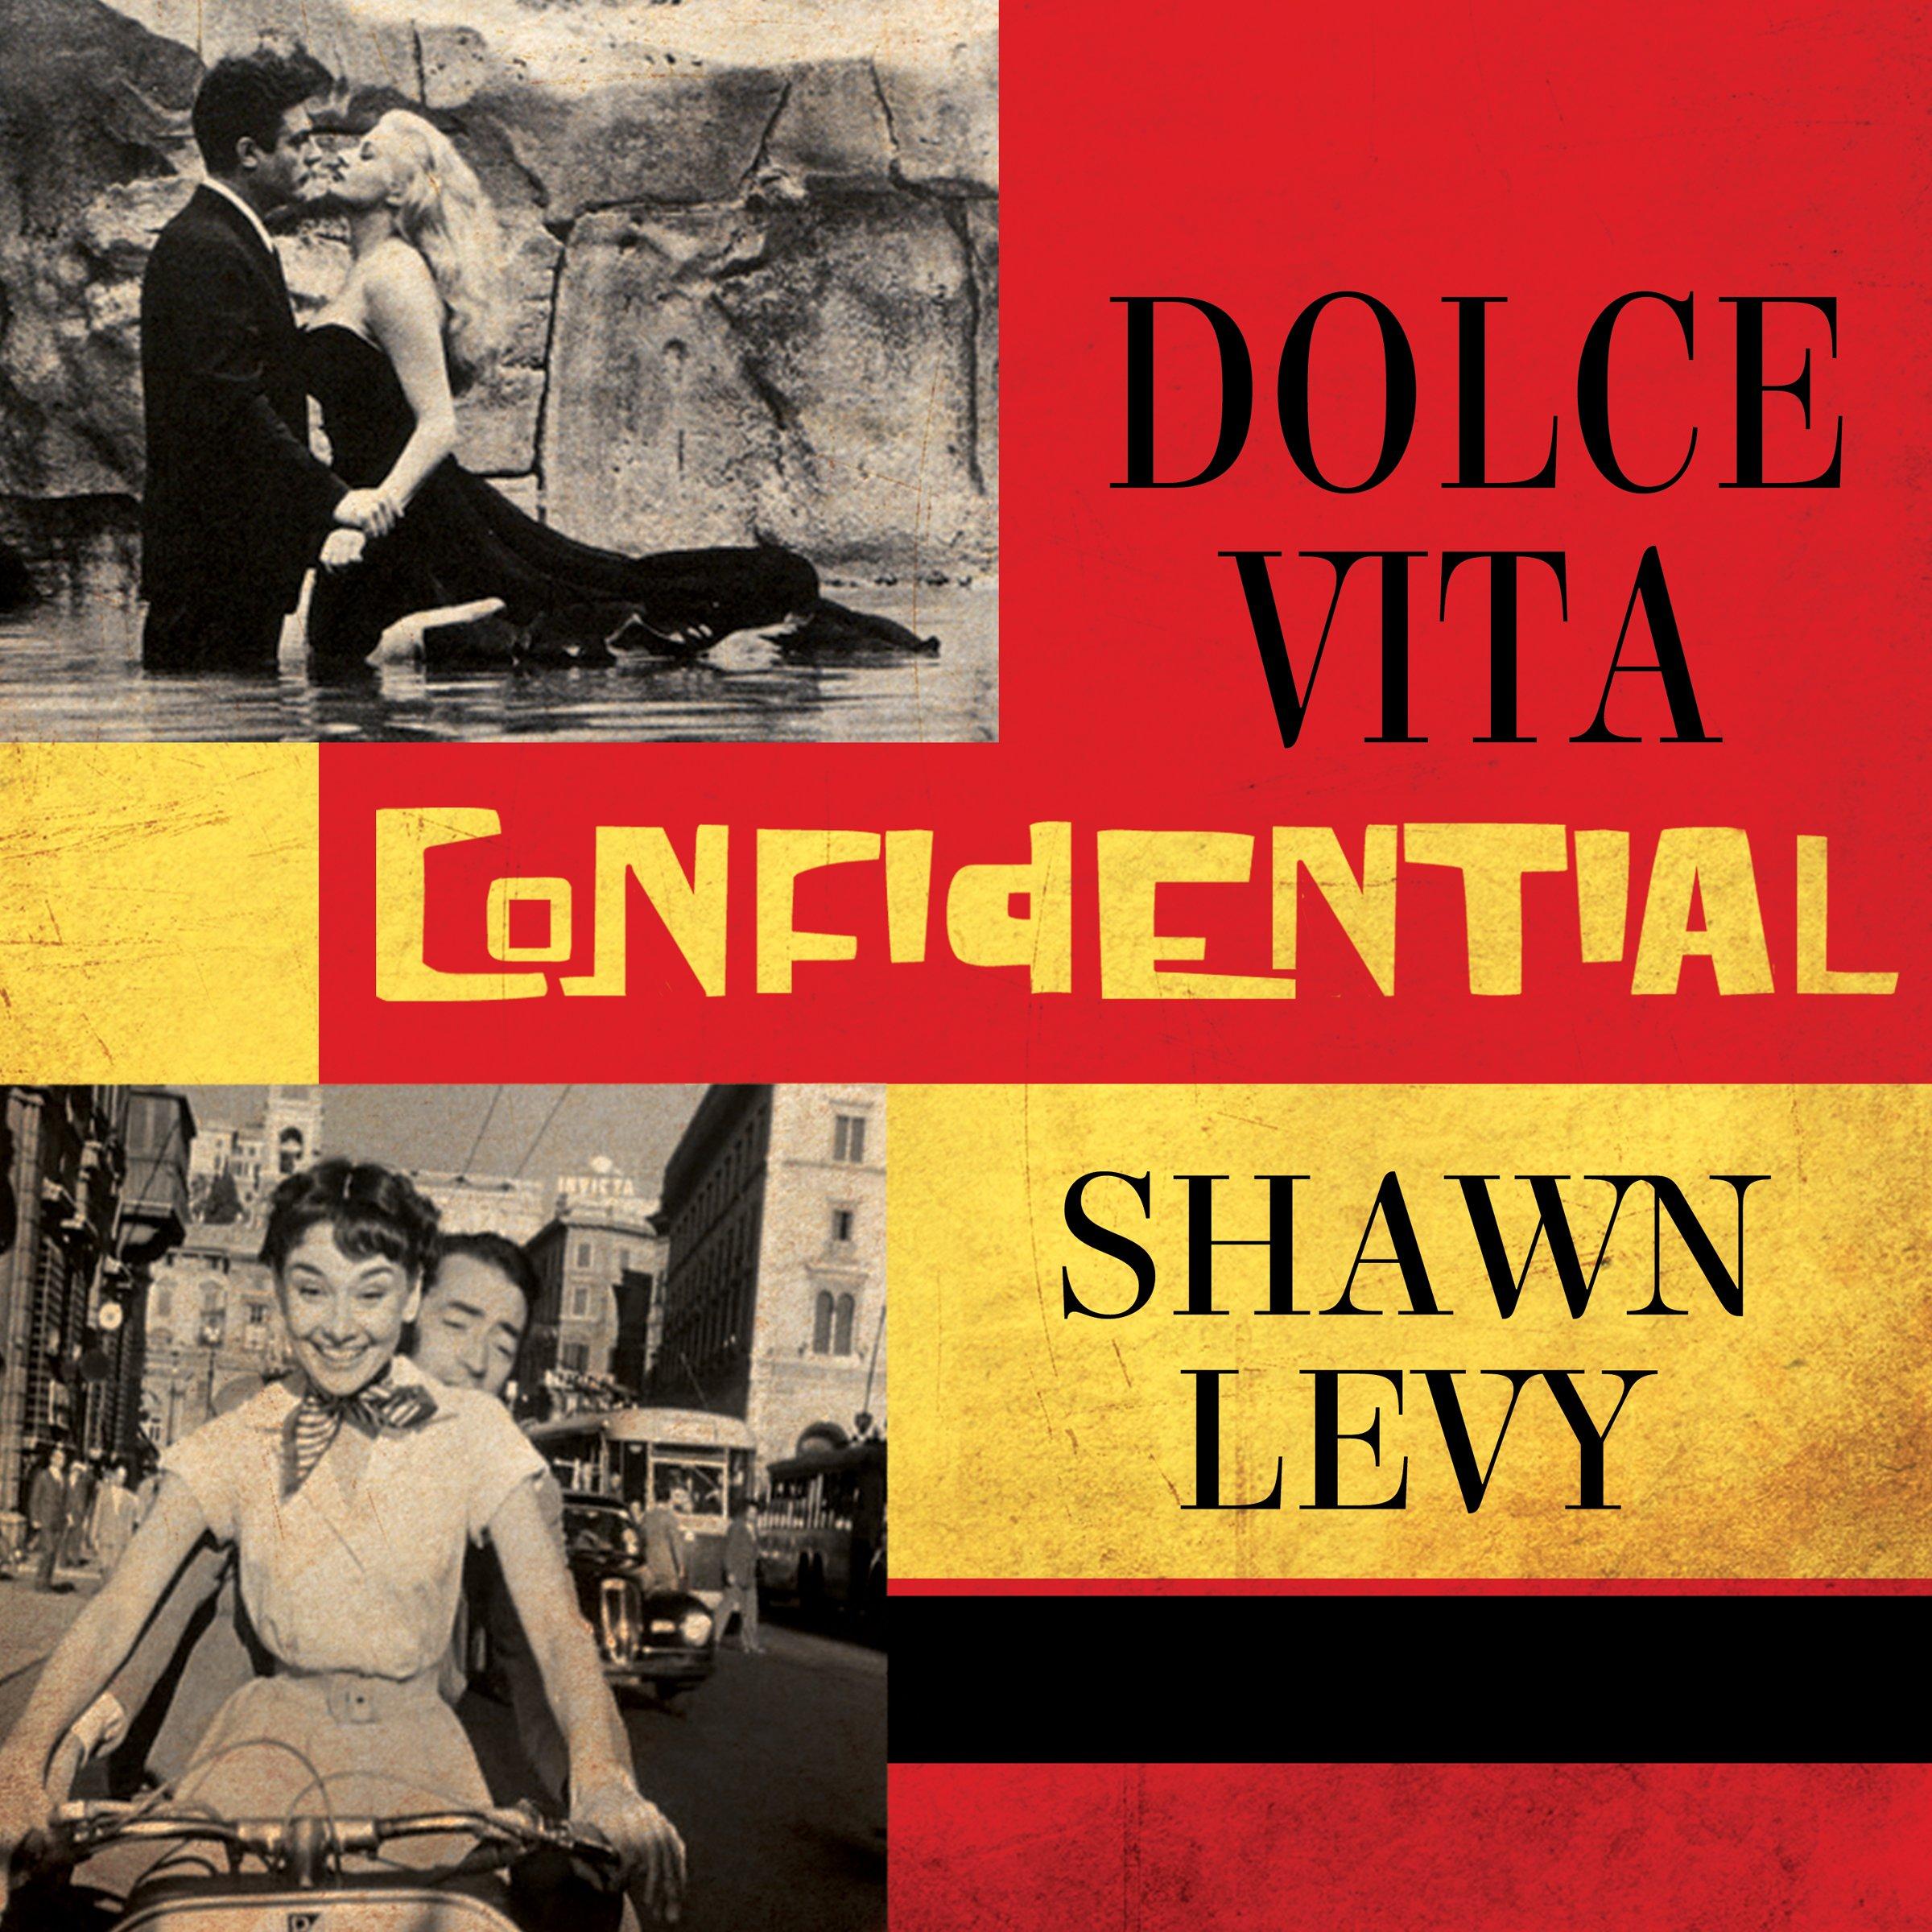 Dolce Vita Confidential: Fellini, Loren, Pucci, Paparazzi, and the Swinging High Life of 1950s Rome